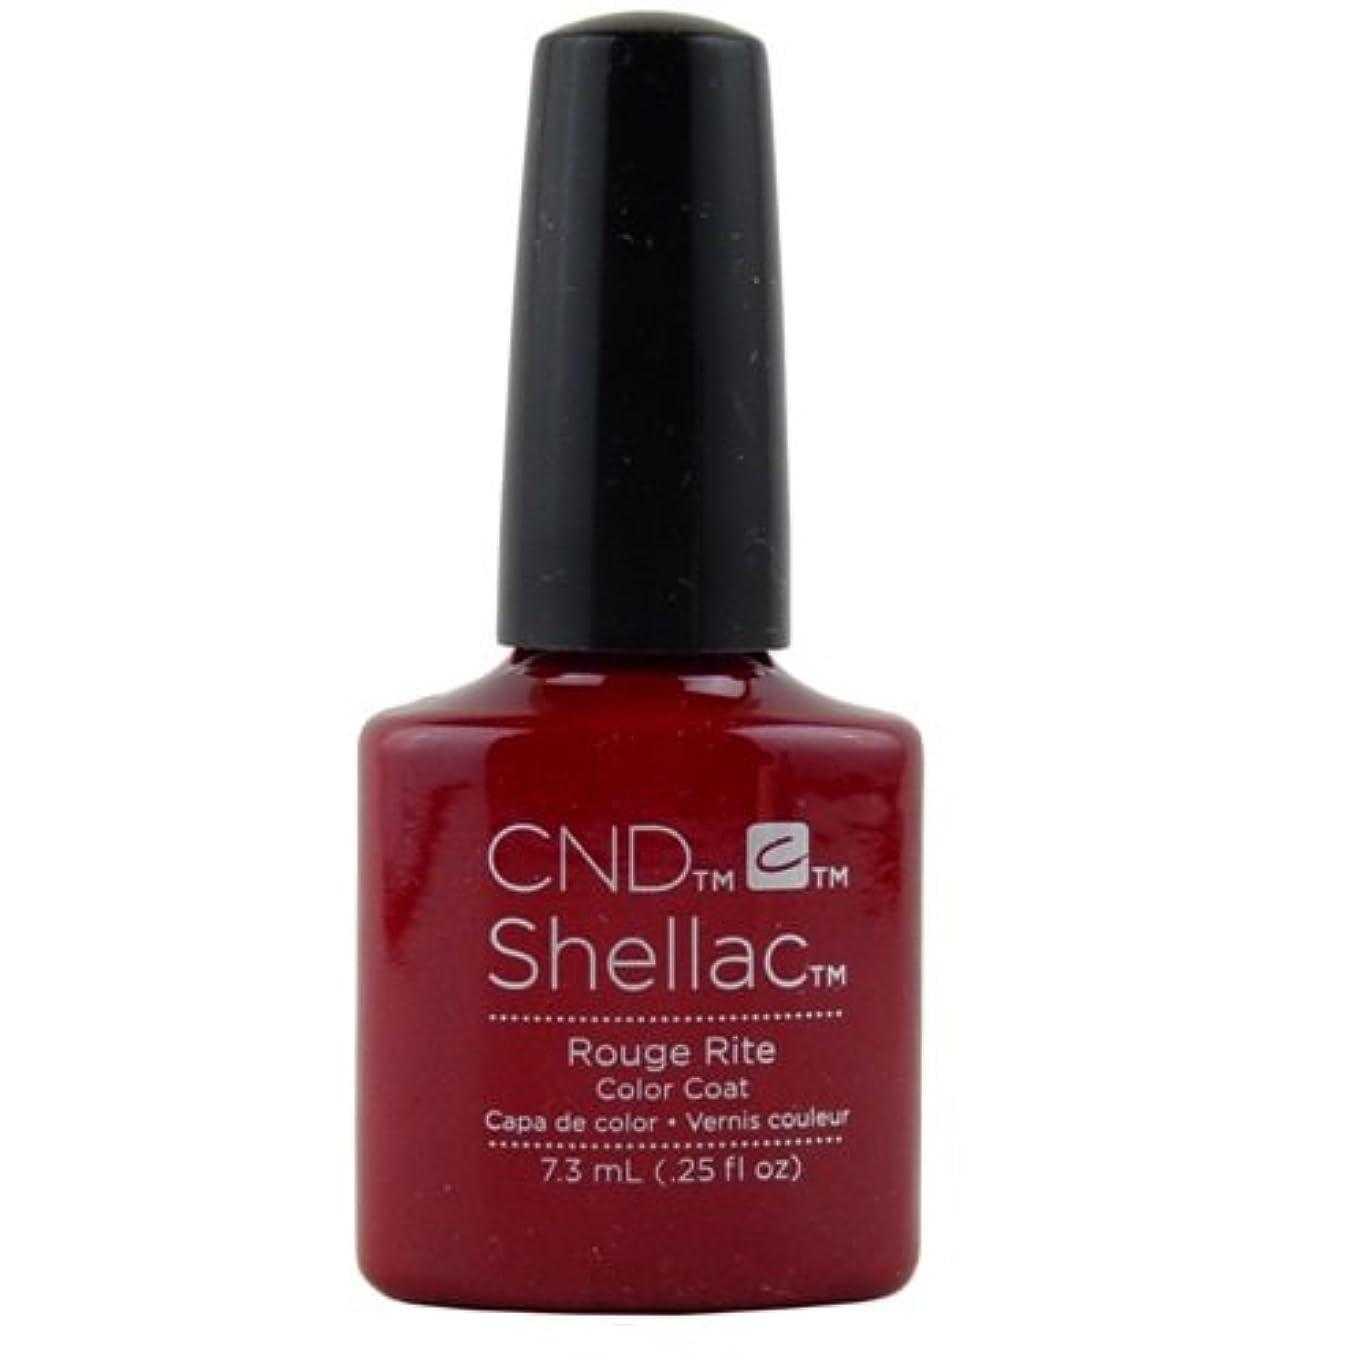 熟達卵無実CND Shellac Gel Polish - Rouge Rite - 0.25oz / 7.3ml